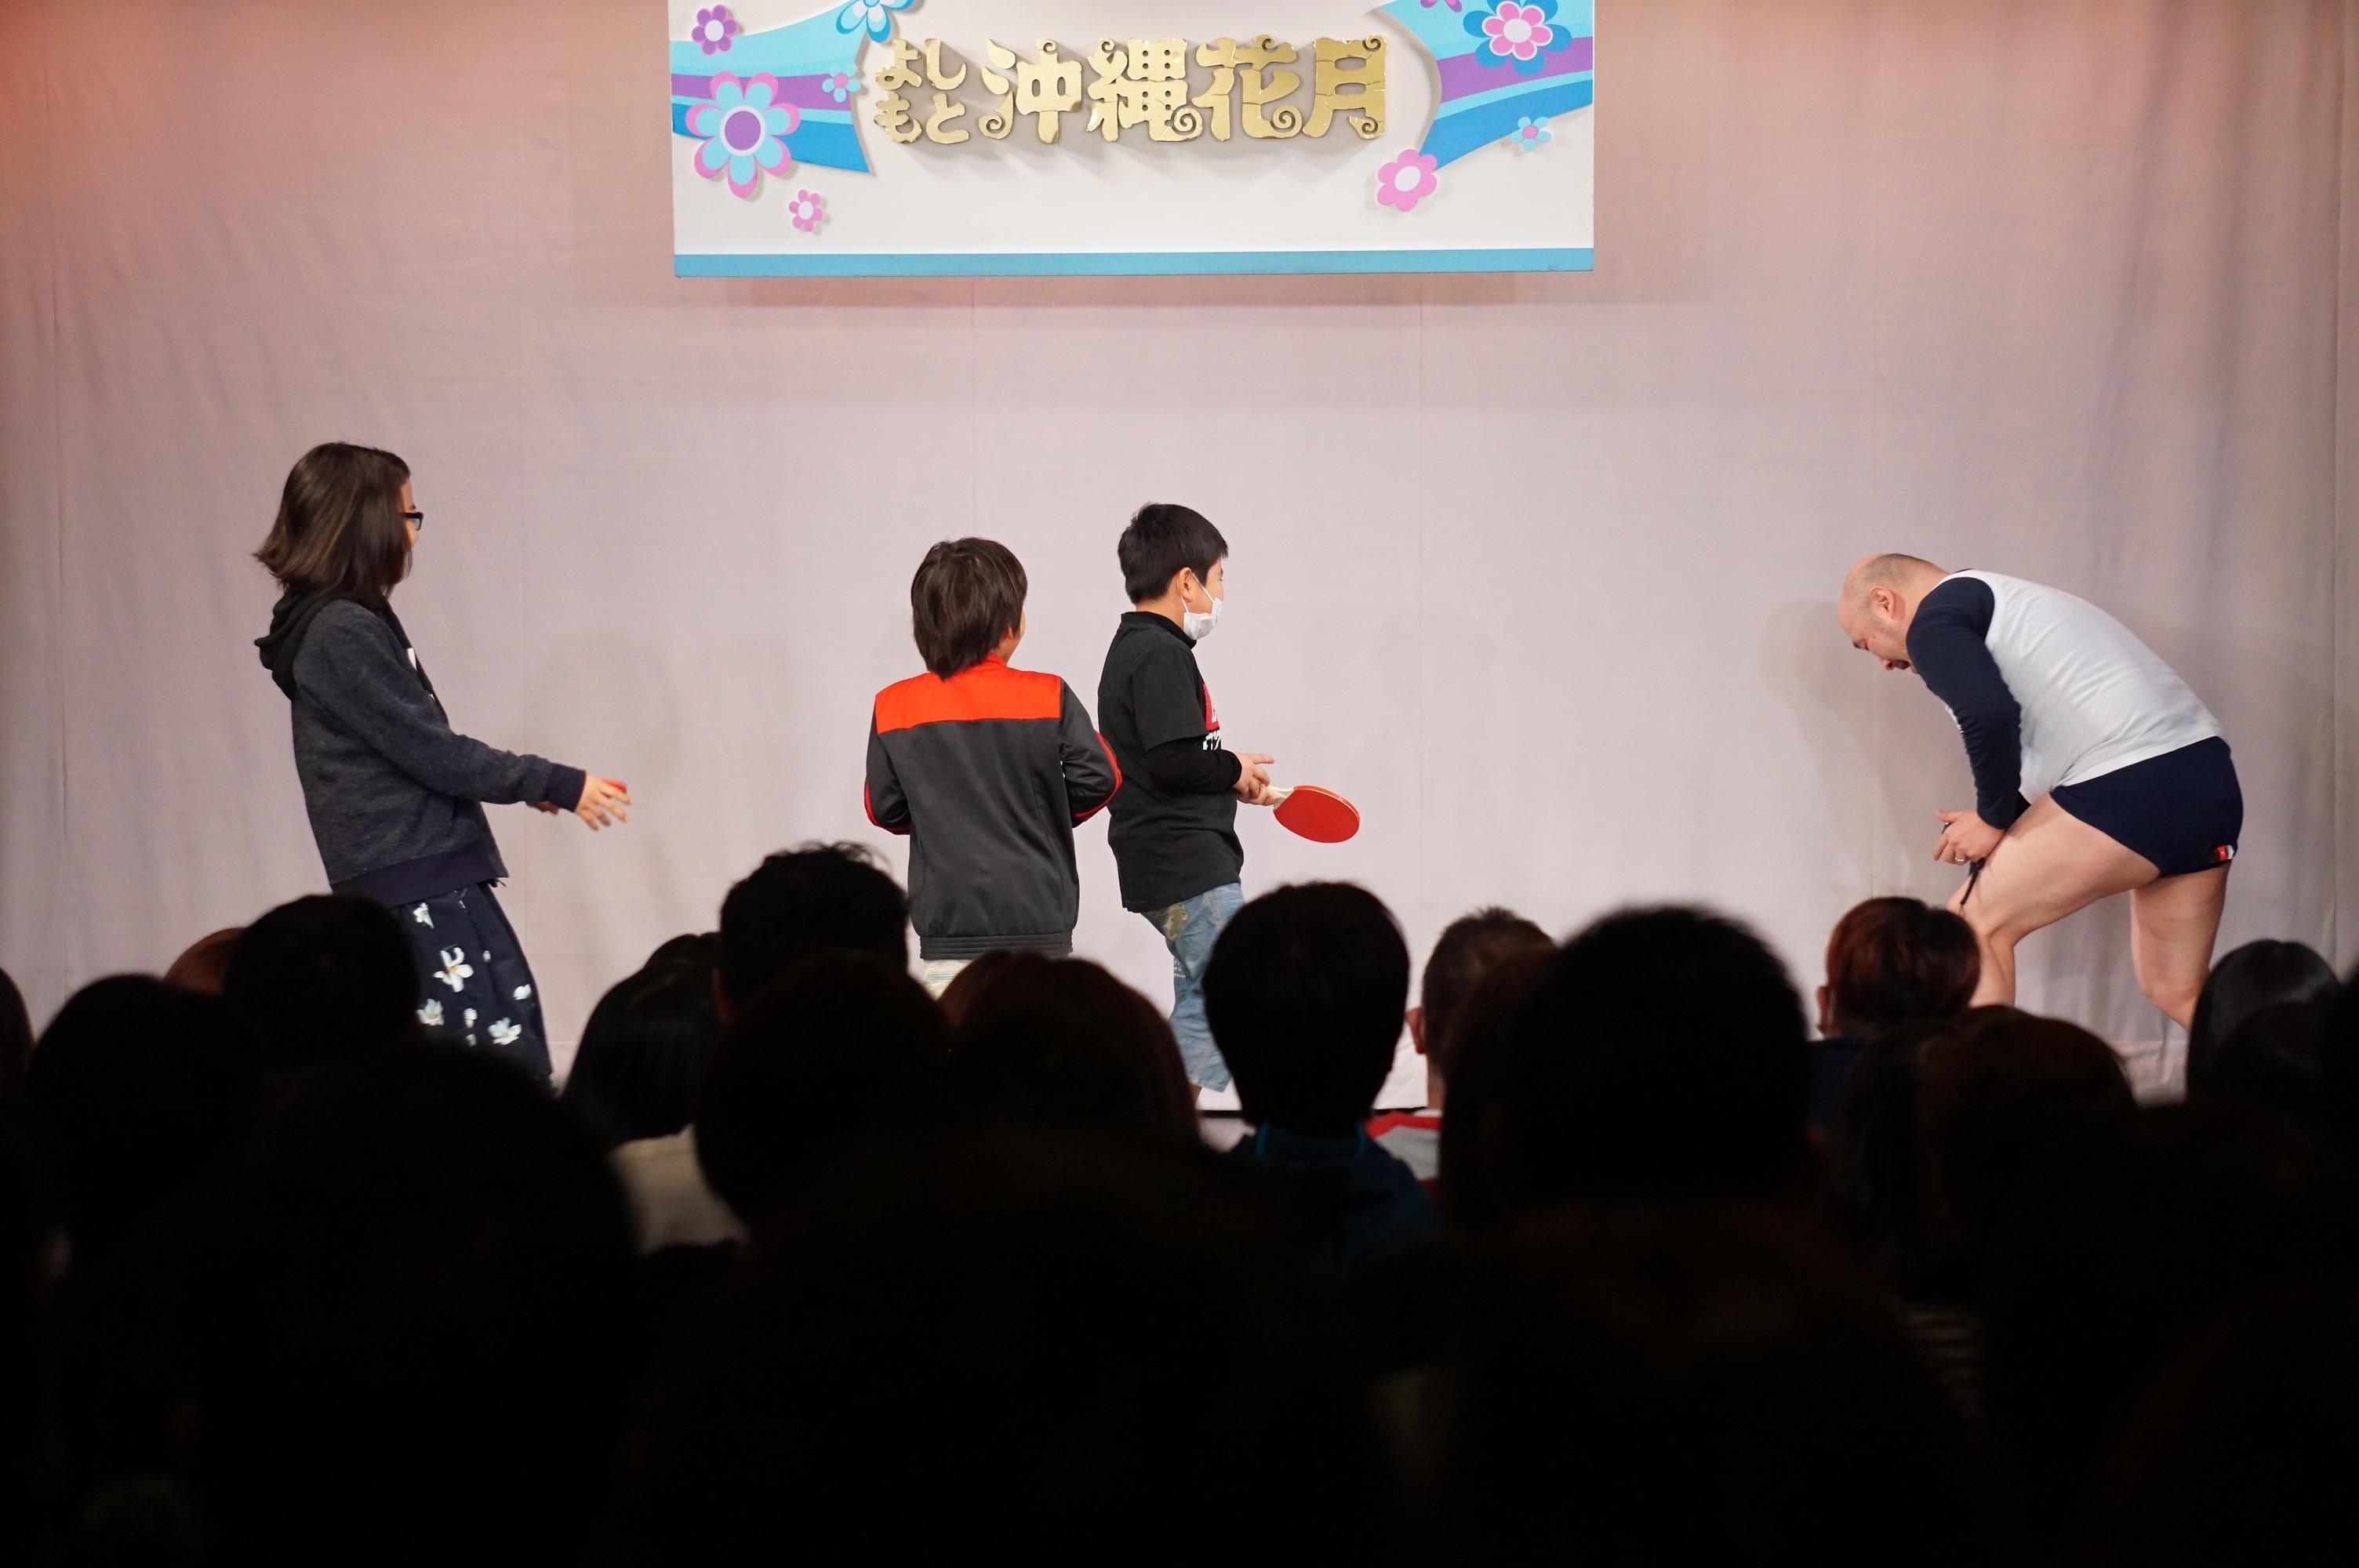 http://news.yoshimoto.co.jp/20170314201410-4397a05b46248b91351d5f4d6552542e0d2fd805.jpg